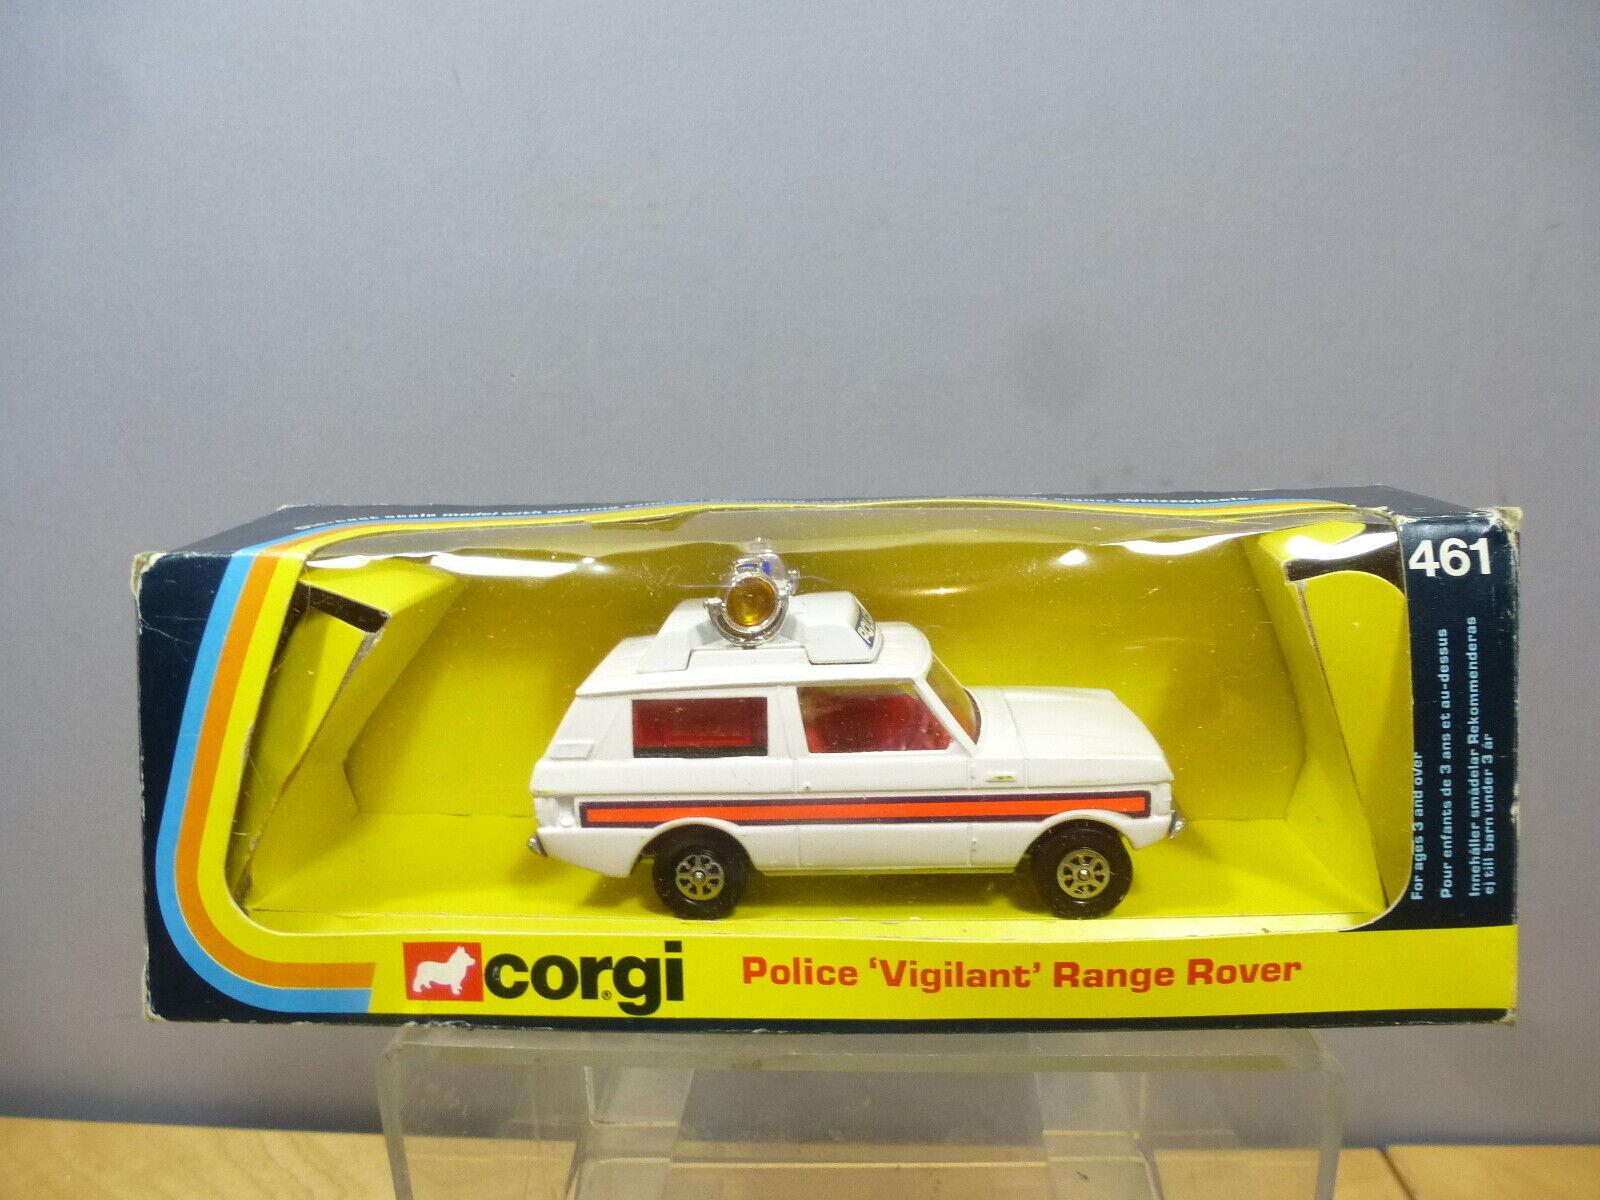 CORGI TOYS MODEL No.461 POLICE VIGIpurpleNT    RANGE ROVER  VN MIB 899008